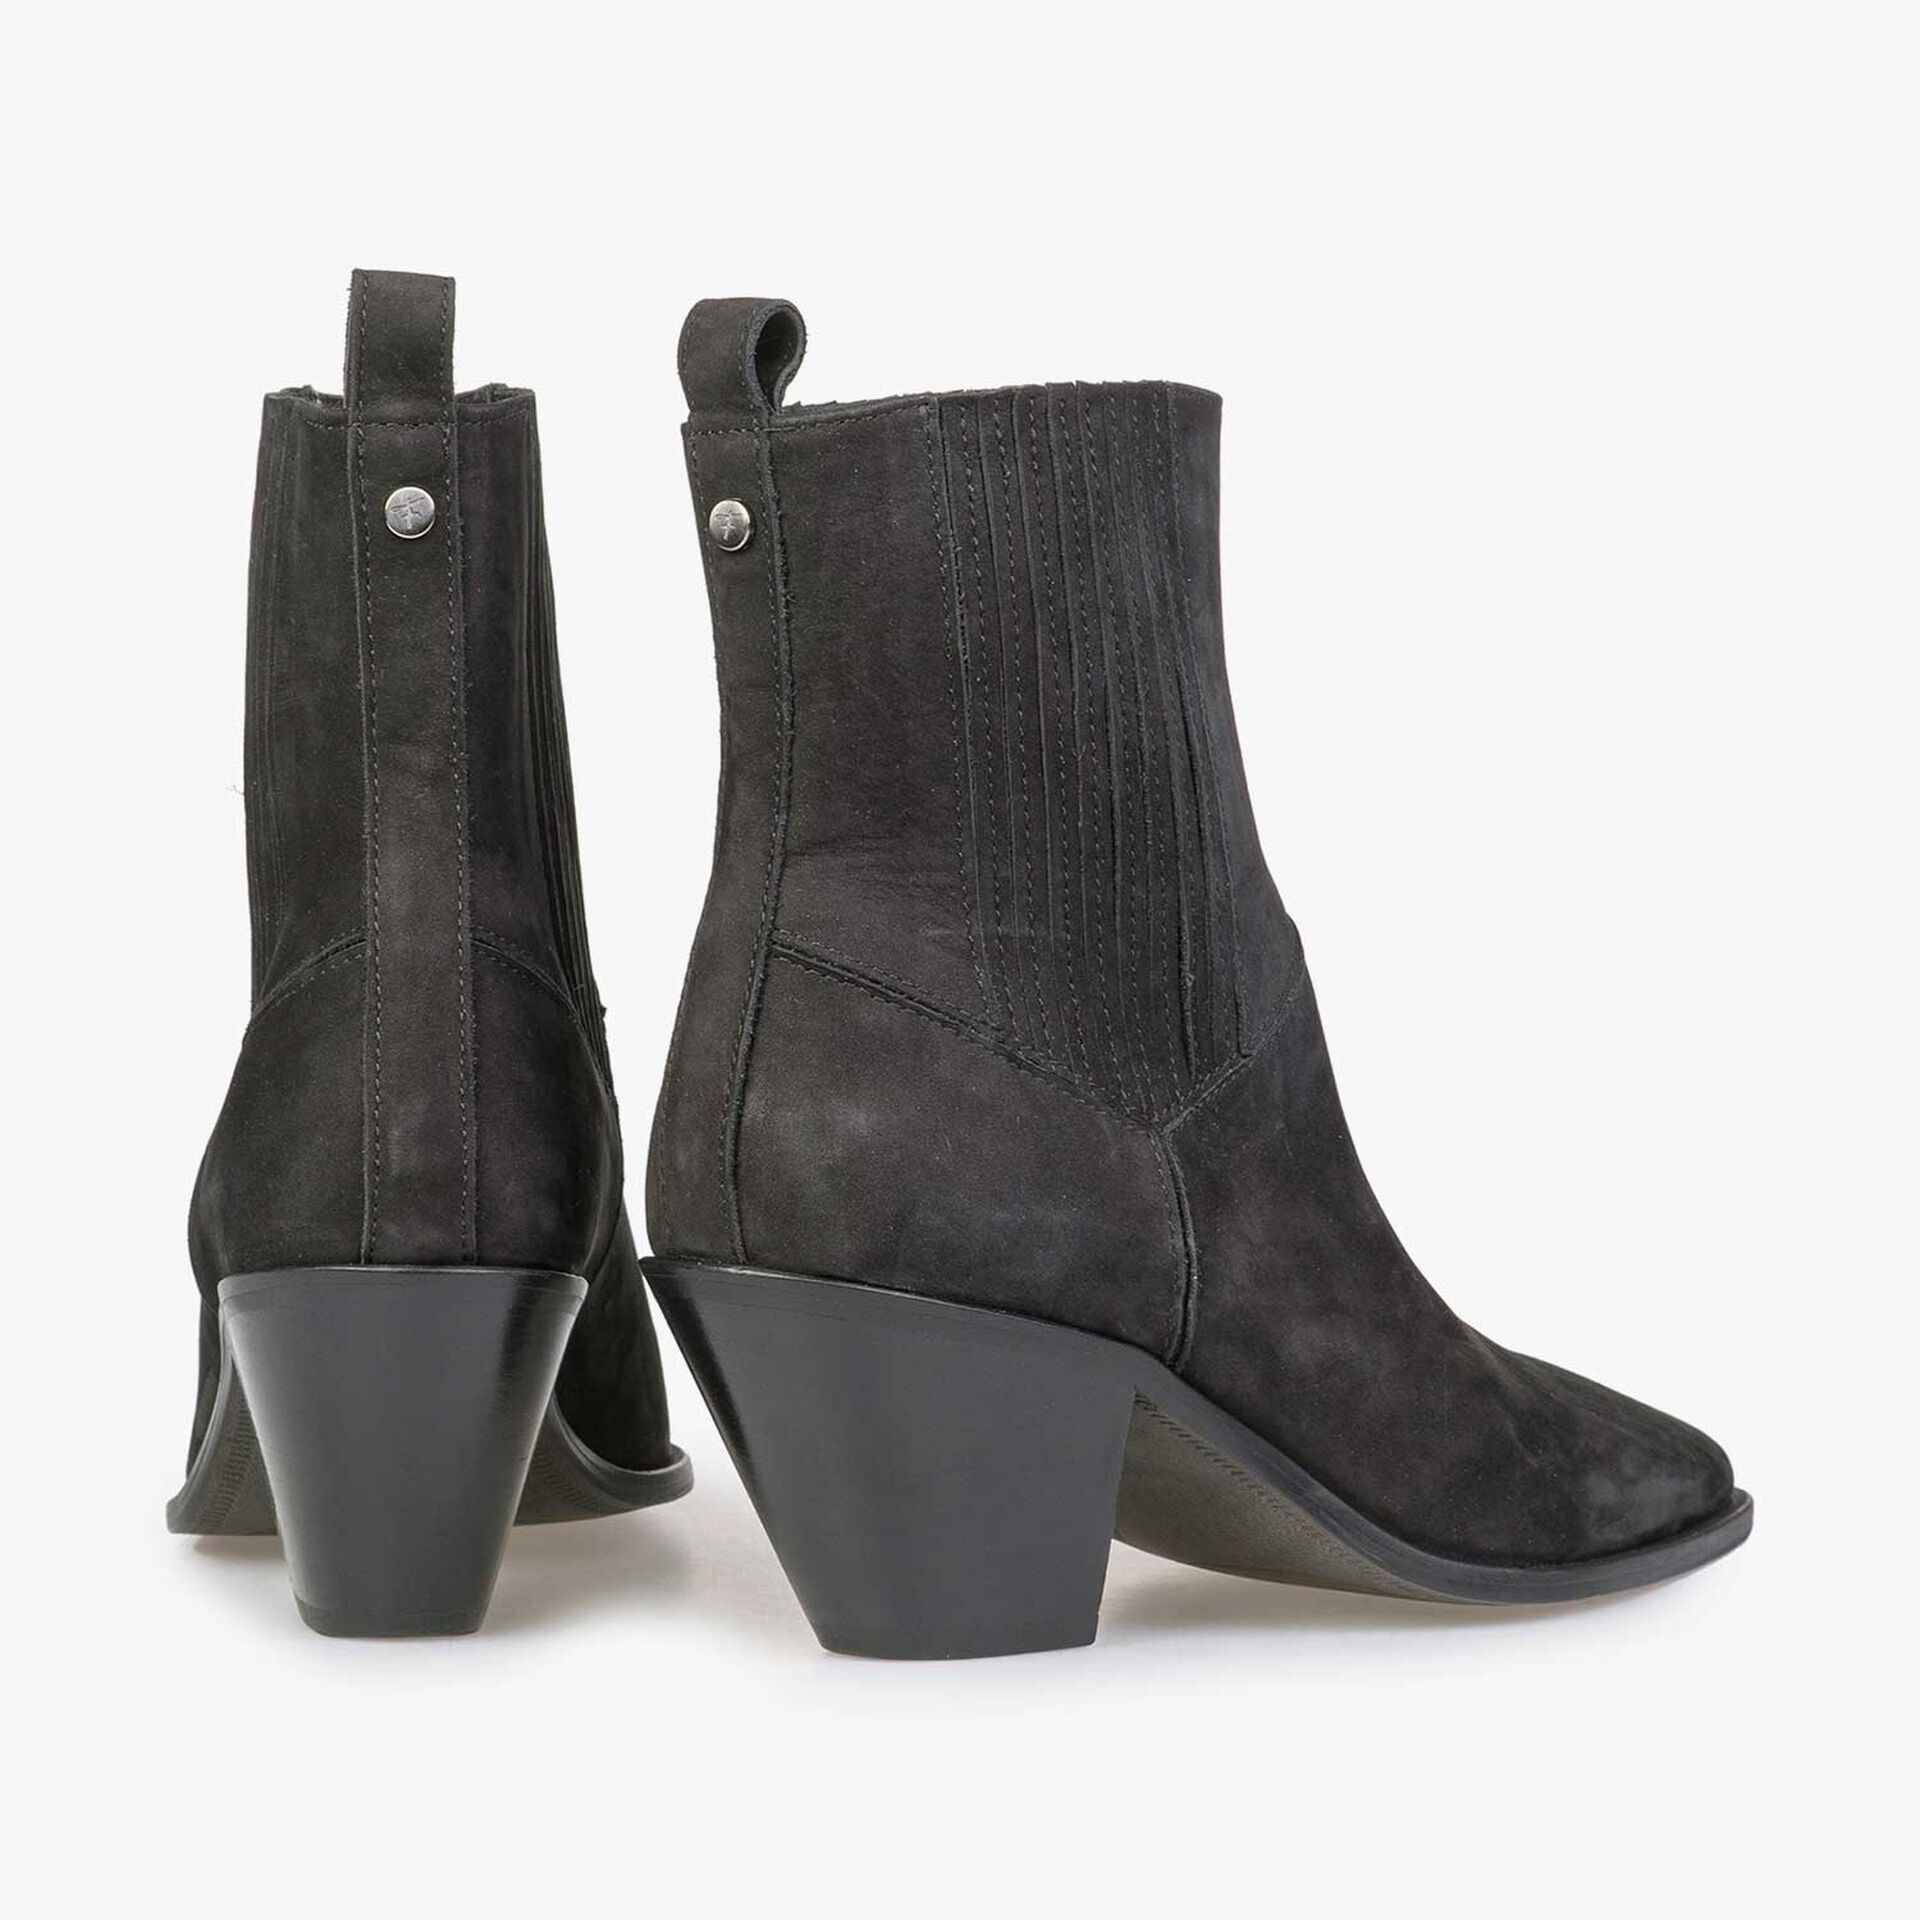 Black nubuck leather Chelsea boot